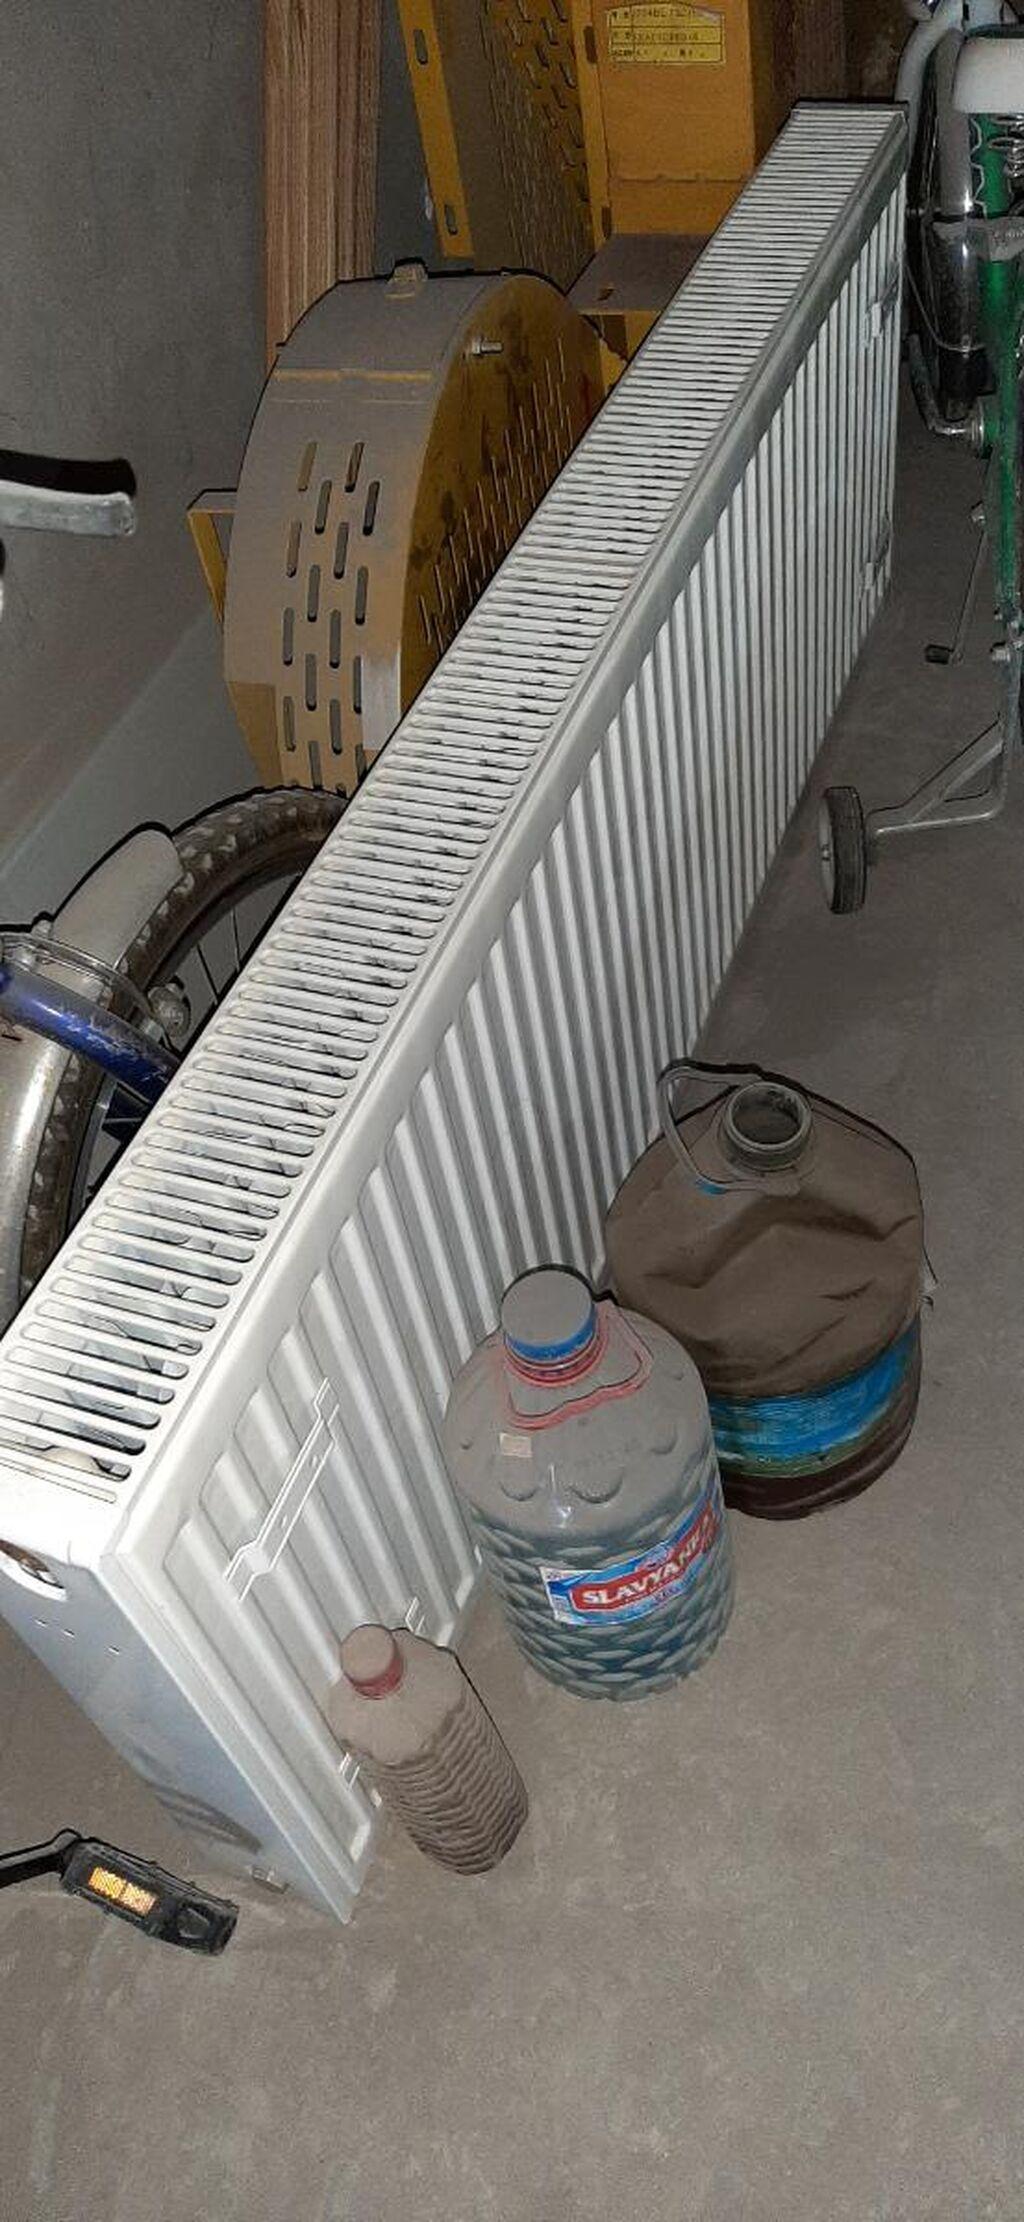 Radiator 1.5metr teze kimidi qalin stenkalidi